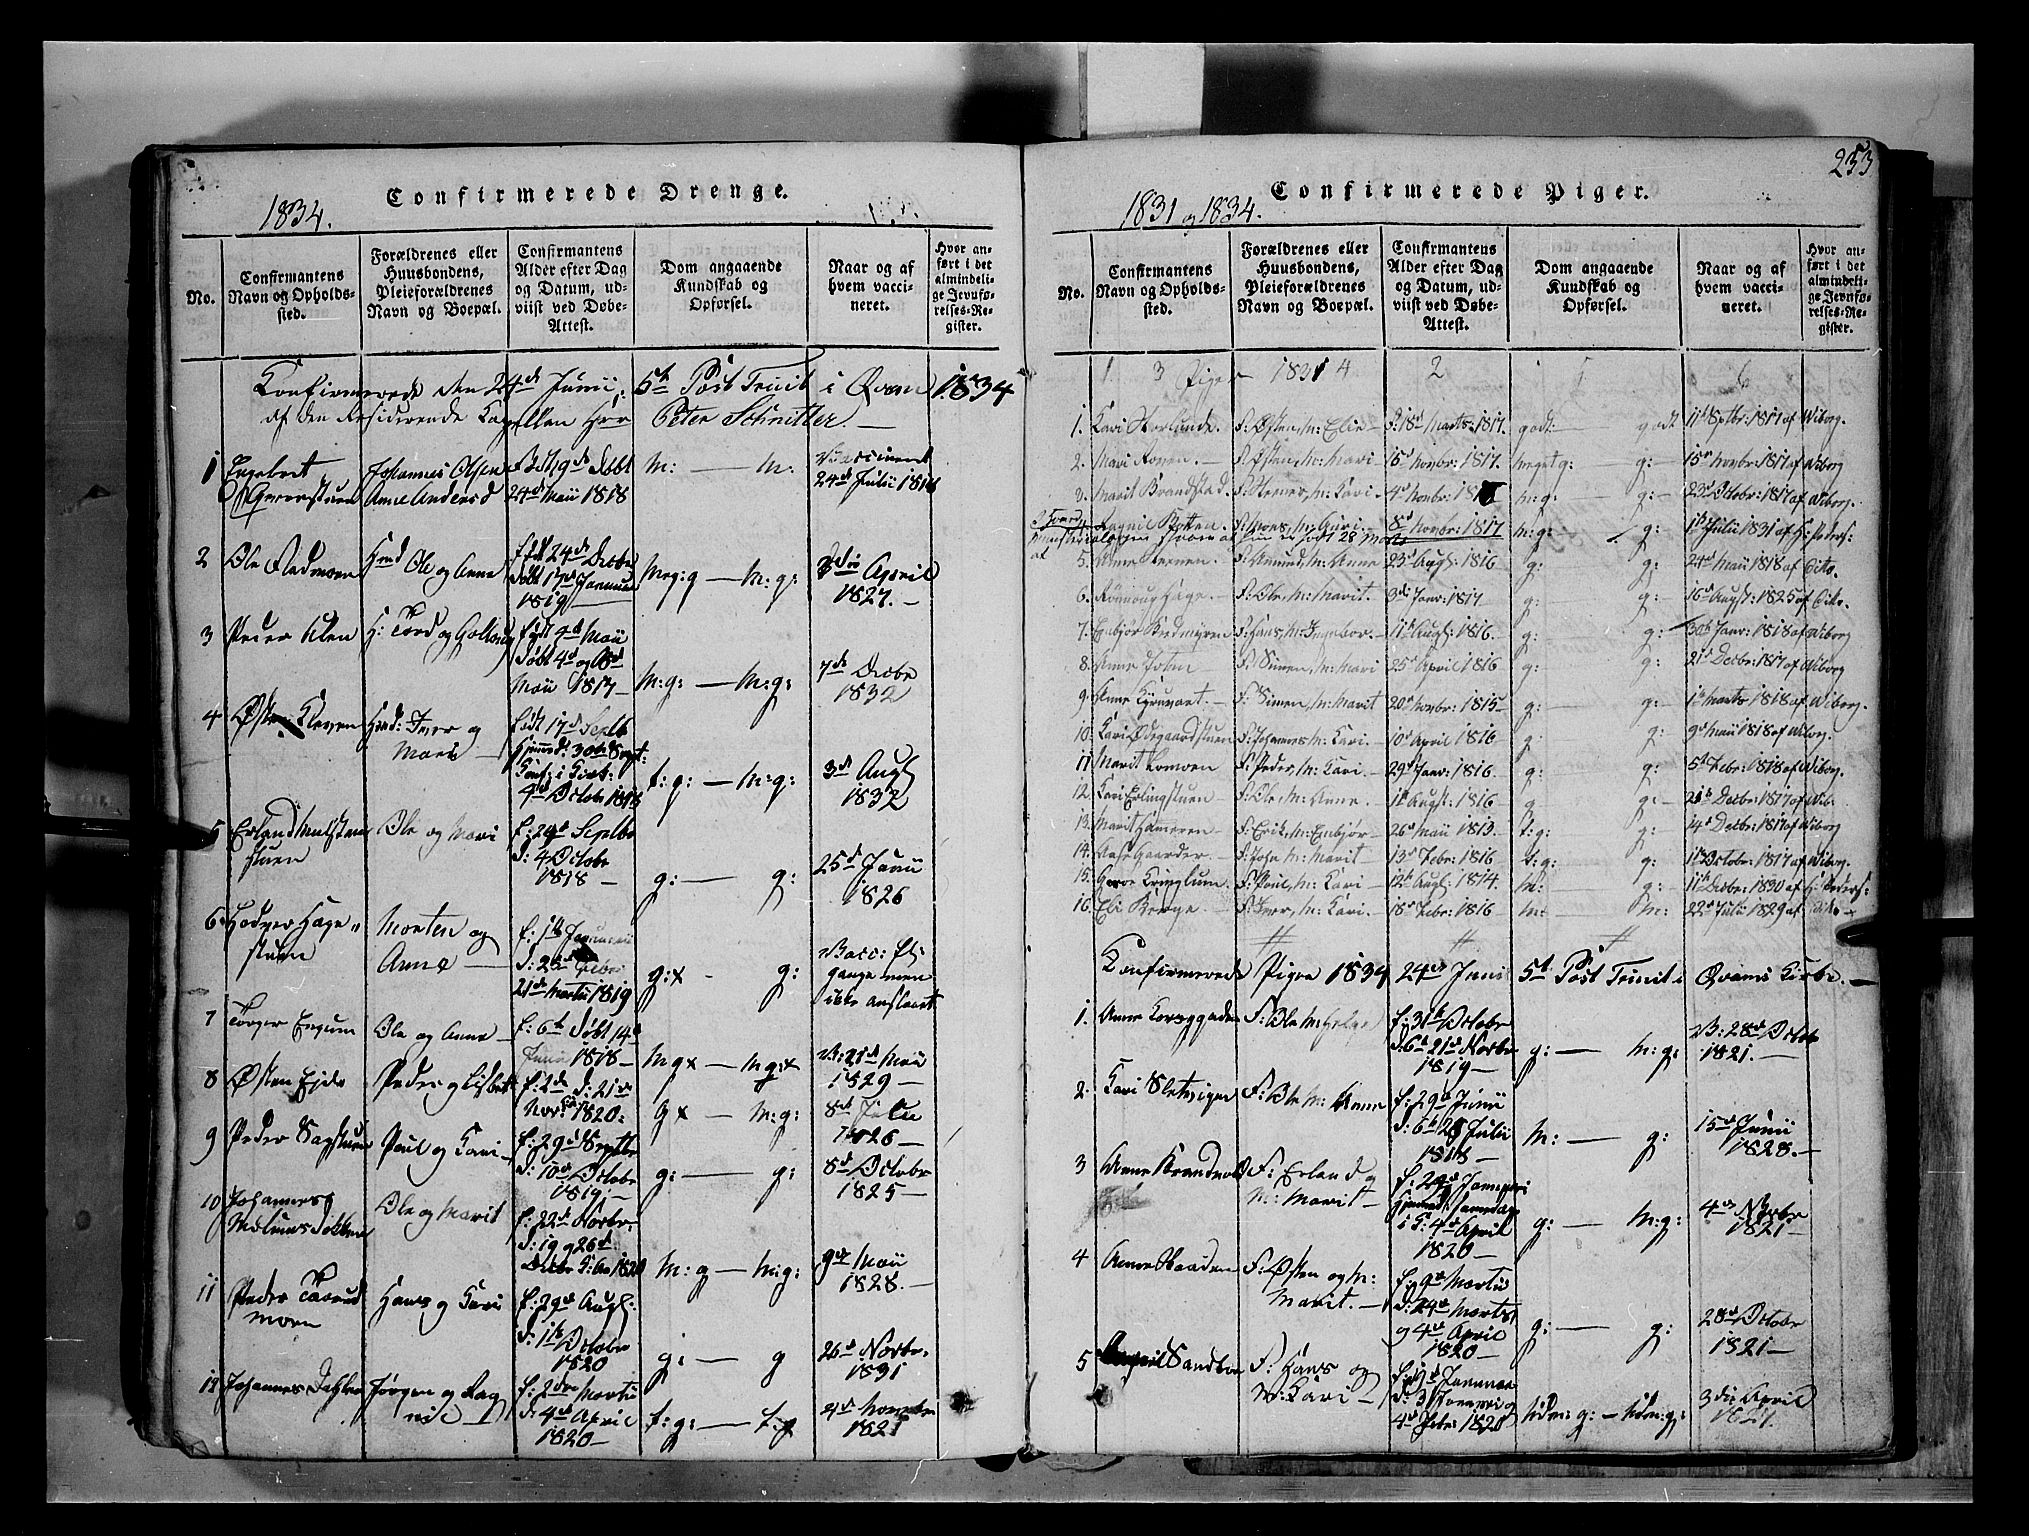 SAH, Fron prestekontor, H/Ha/Hab/L0004: Klokkerbok nr. 4, 1816-1850, s. 253